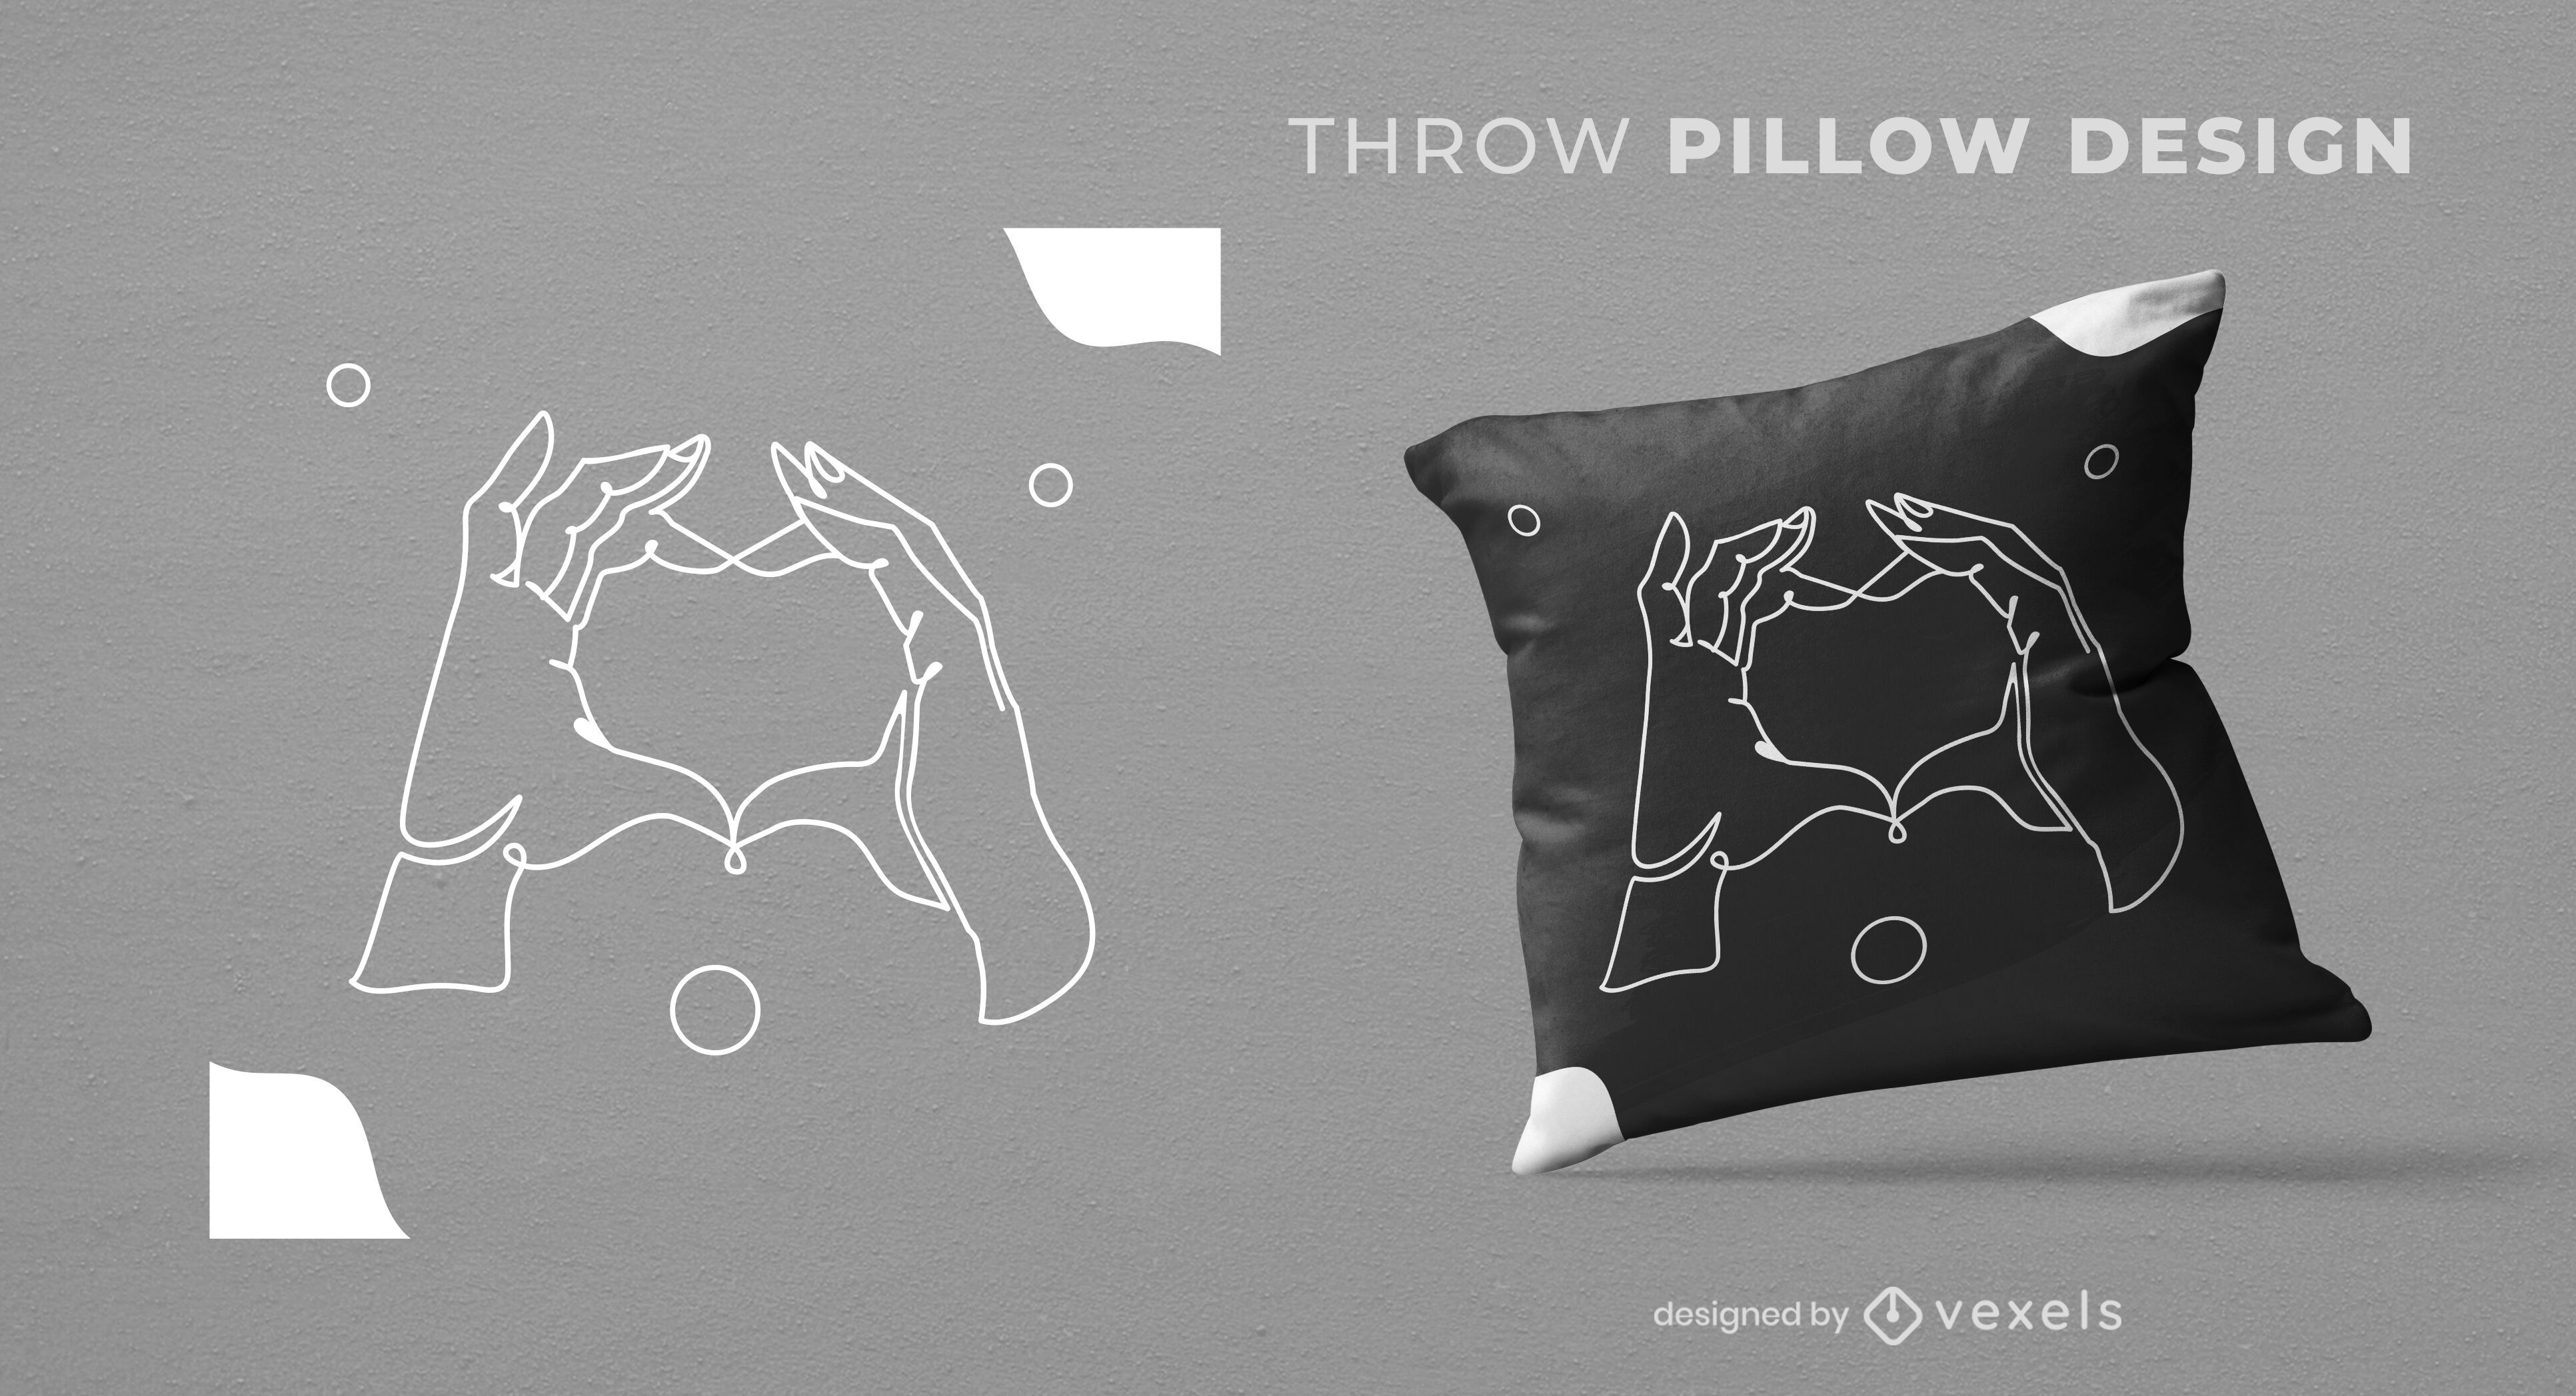 Diseño de almohada de tiro de manos en forma de corazón